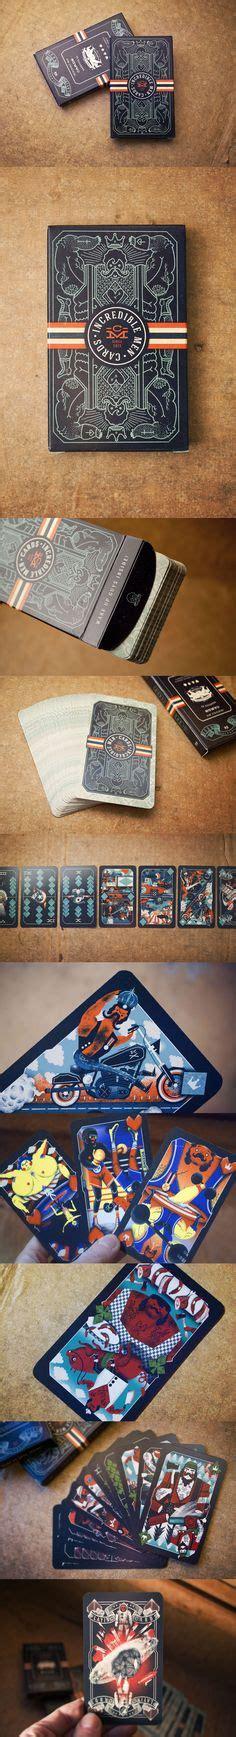 gambling images vintage slot machines deck